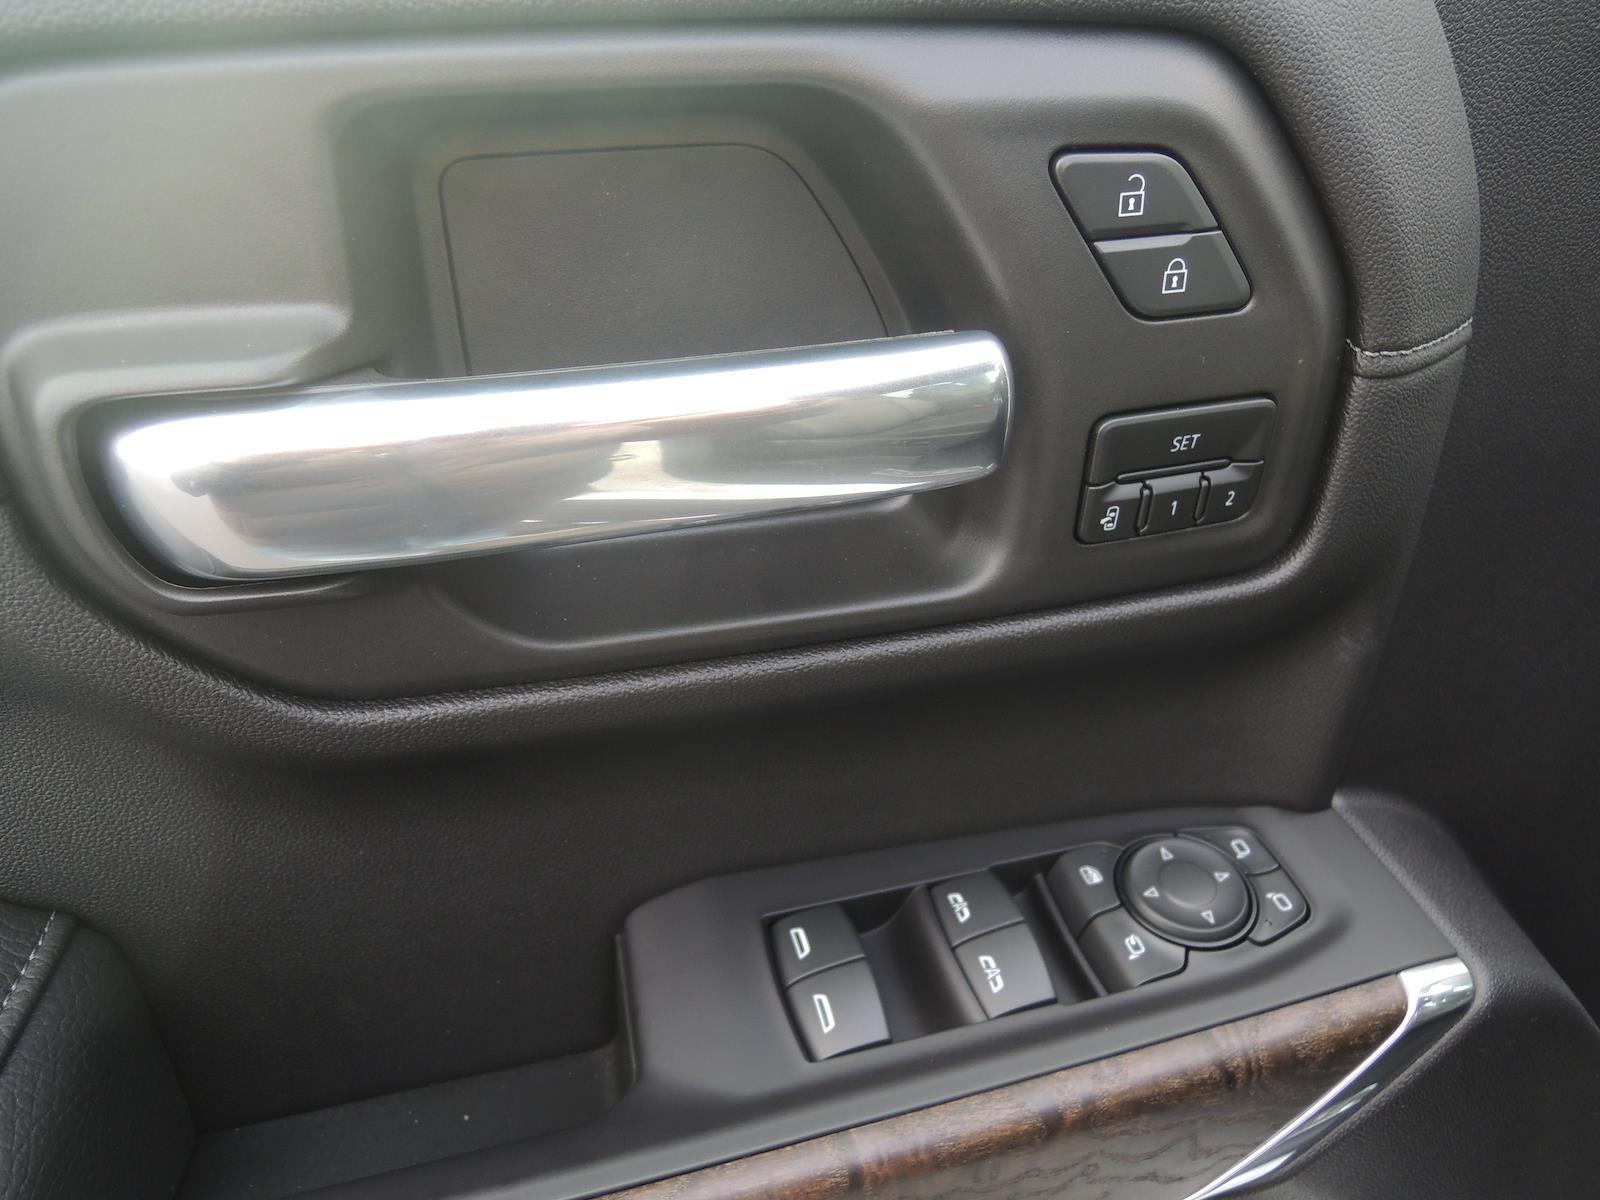 2021 GMC Sierra 1500 Crew Cab 4x4, Pickup #MT434 - photo 19